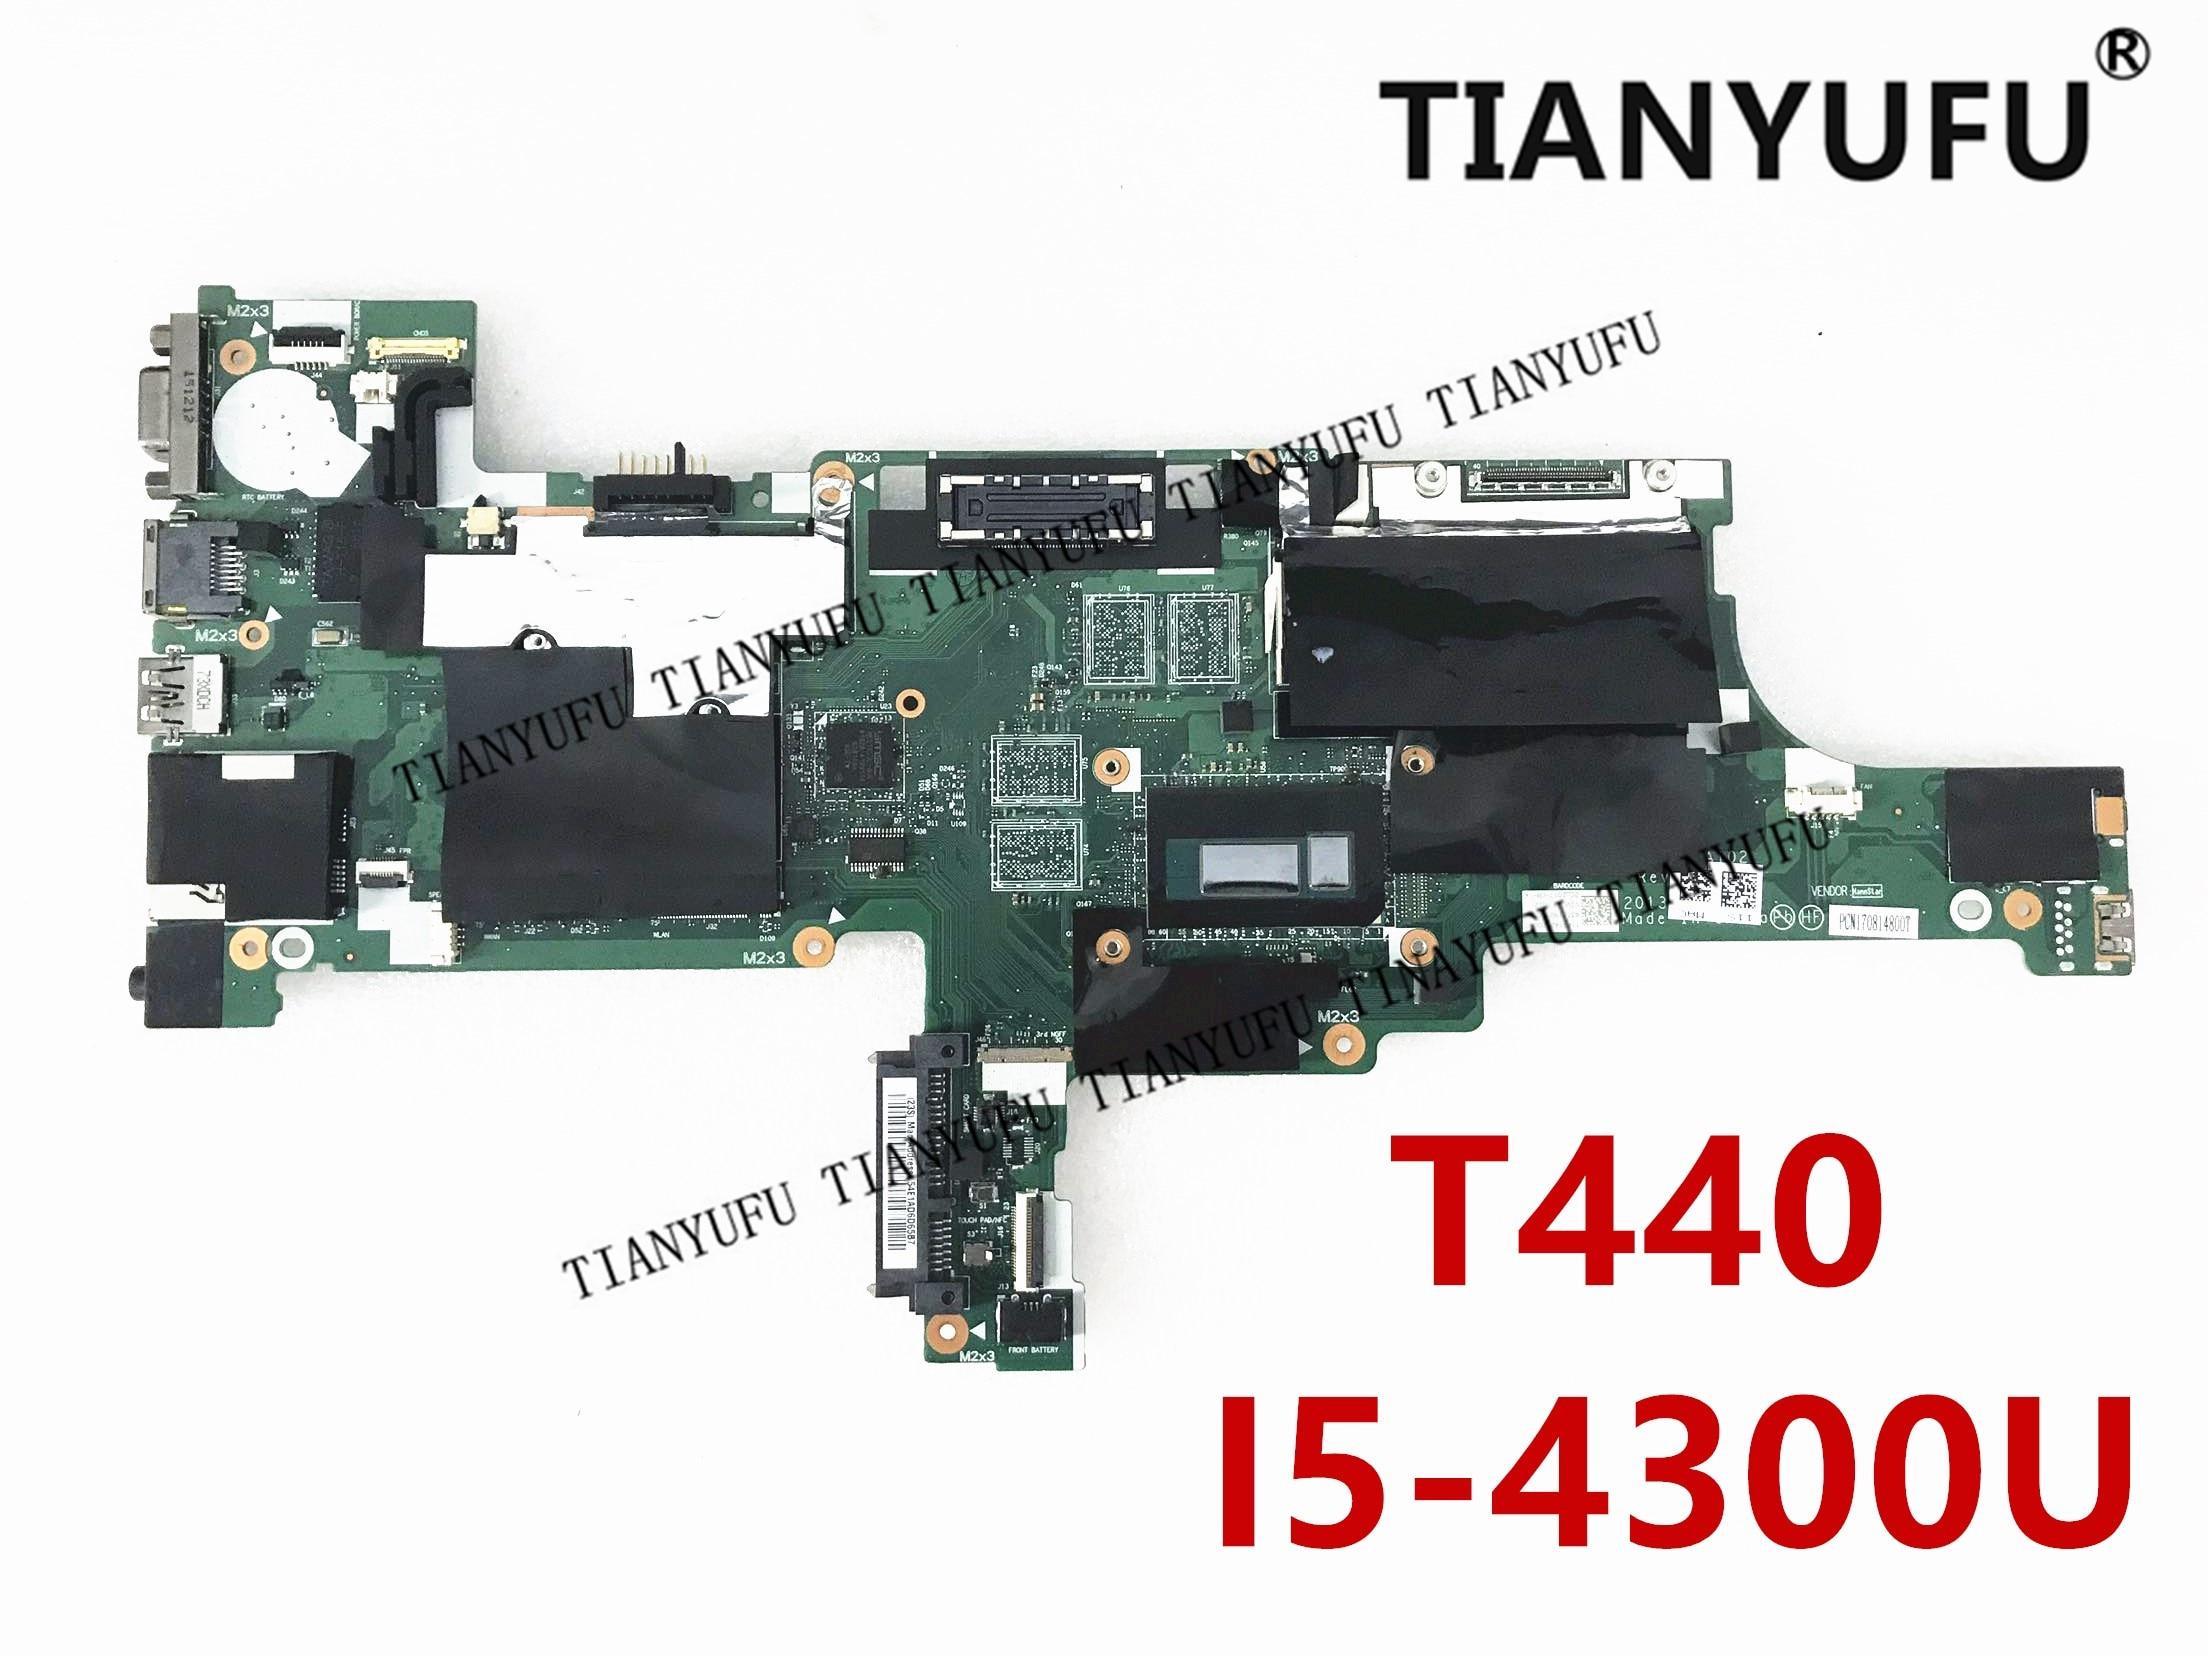 Для LENOVO Thinkpad T440 Материнская плата ноутбука 04X5012 04X5010 04X501104X5014 VIVL0 NM-A102 I5-4300U материнская плата протестированная 100% работа